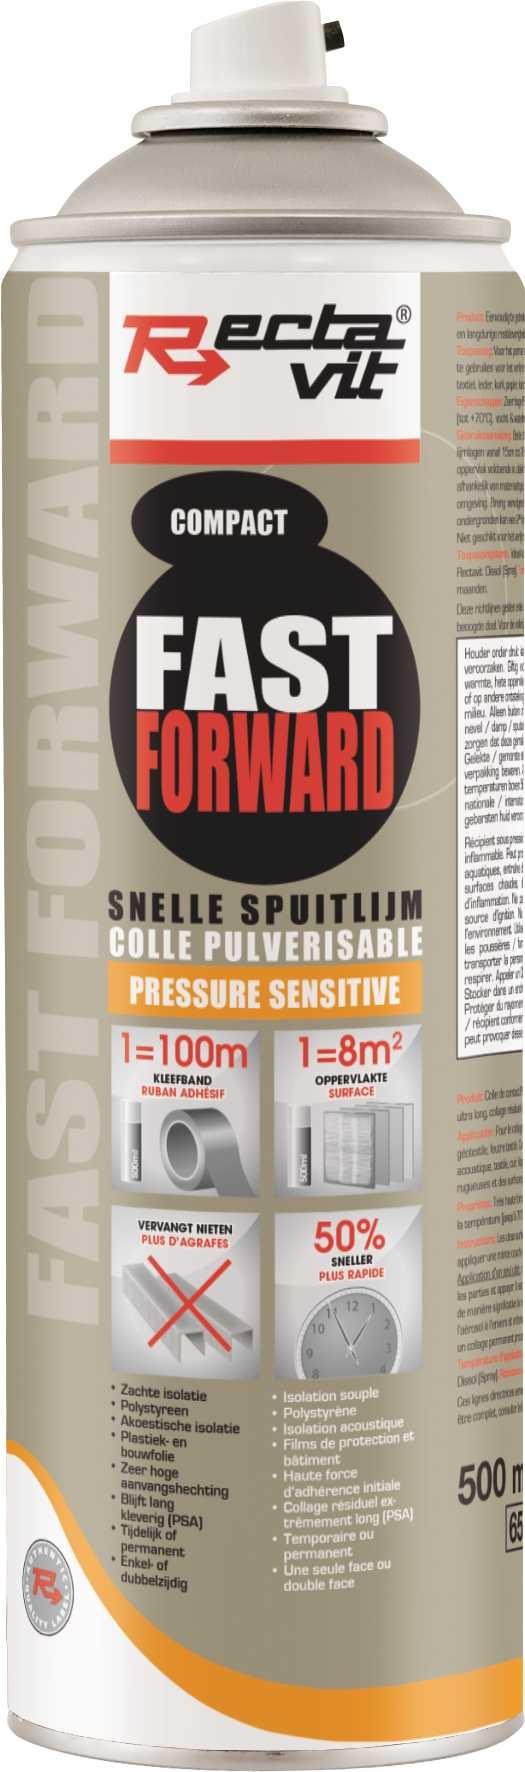 1129 - Fast Forward Compact - 500 ml